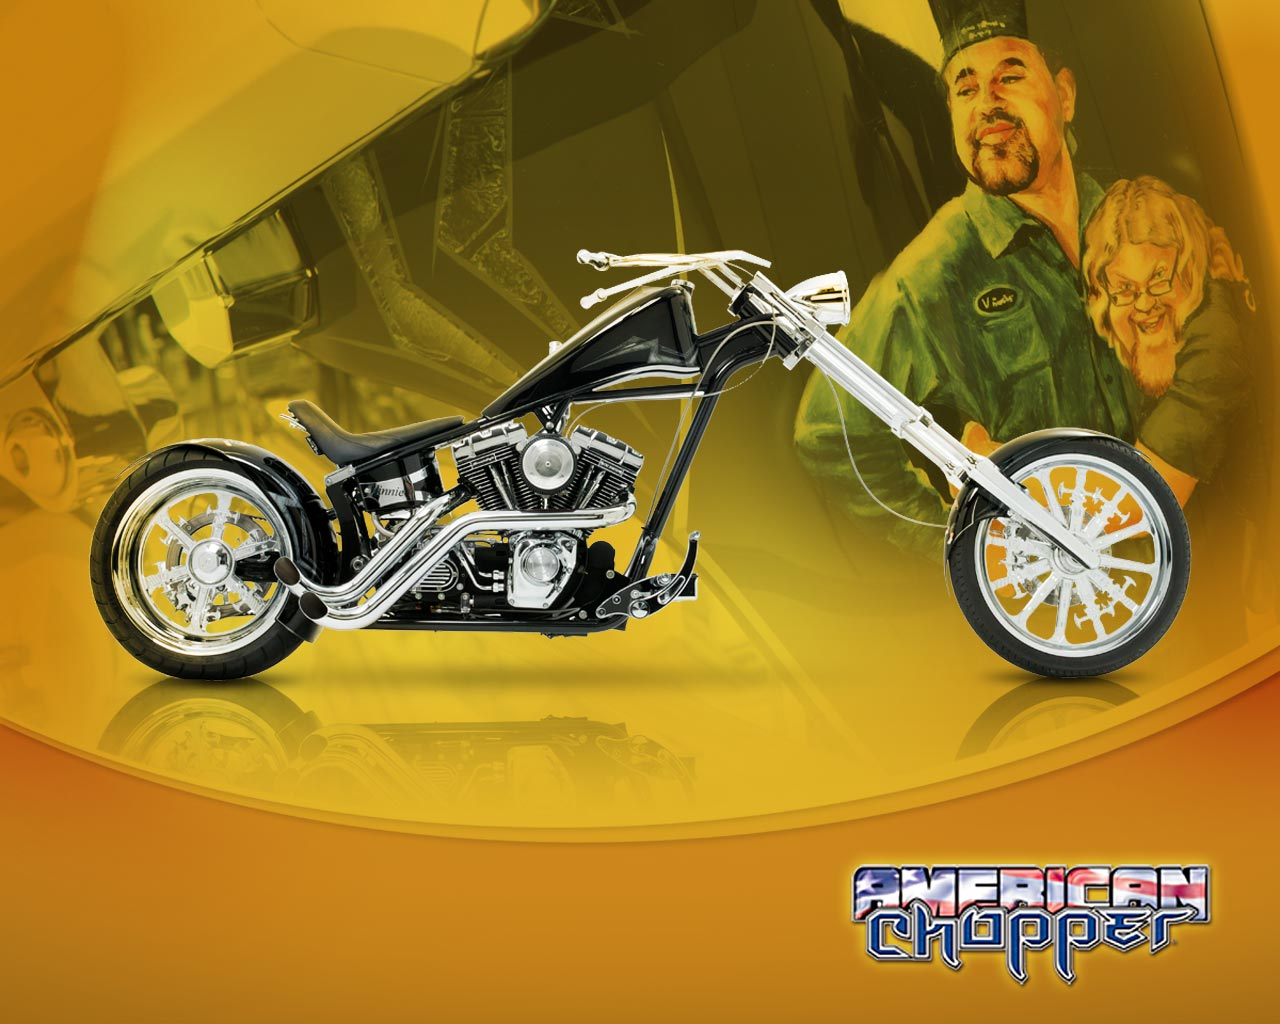 American chopper orange county choppers 124420 1280 1024jpg 1280x1024